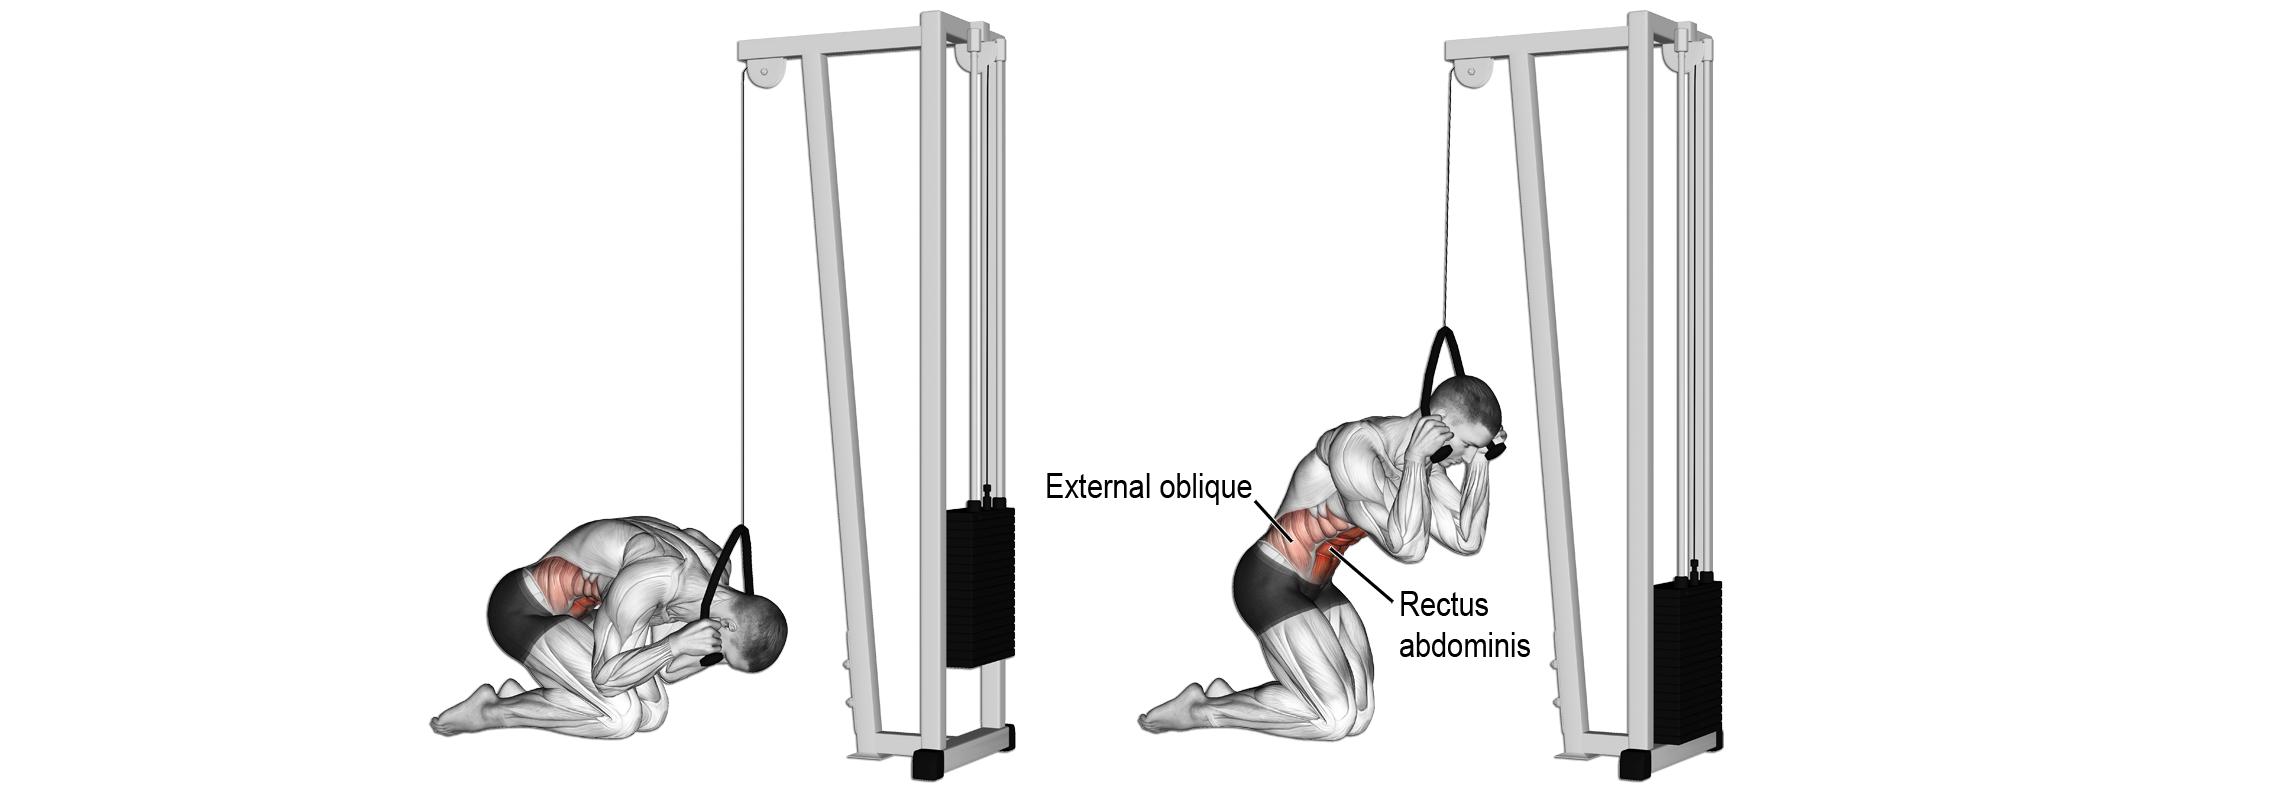 allachy - trening brzucha